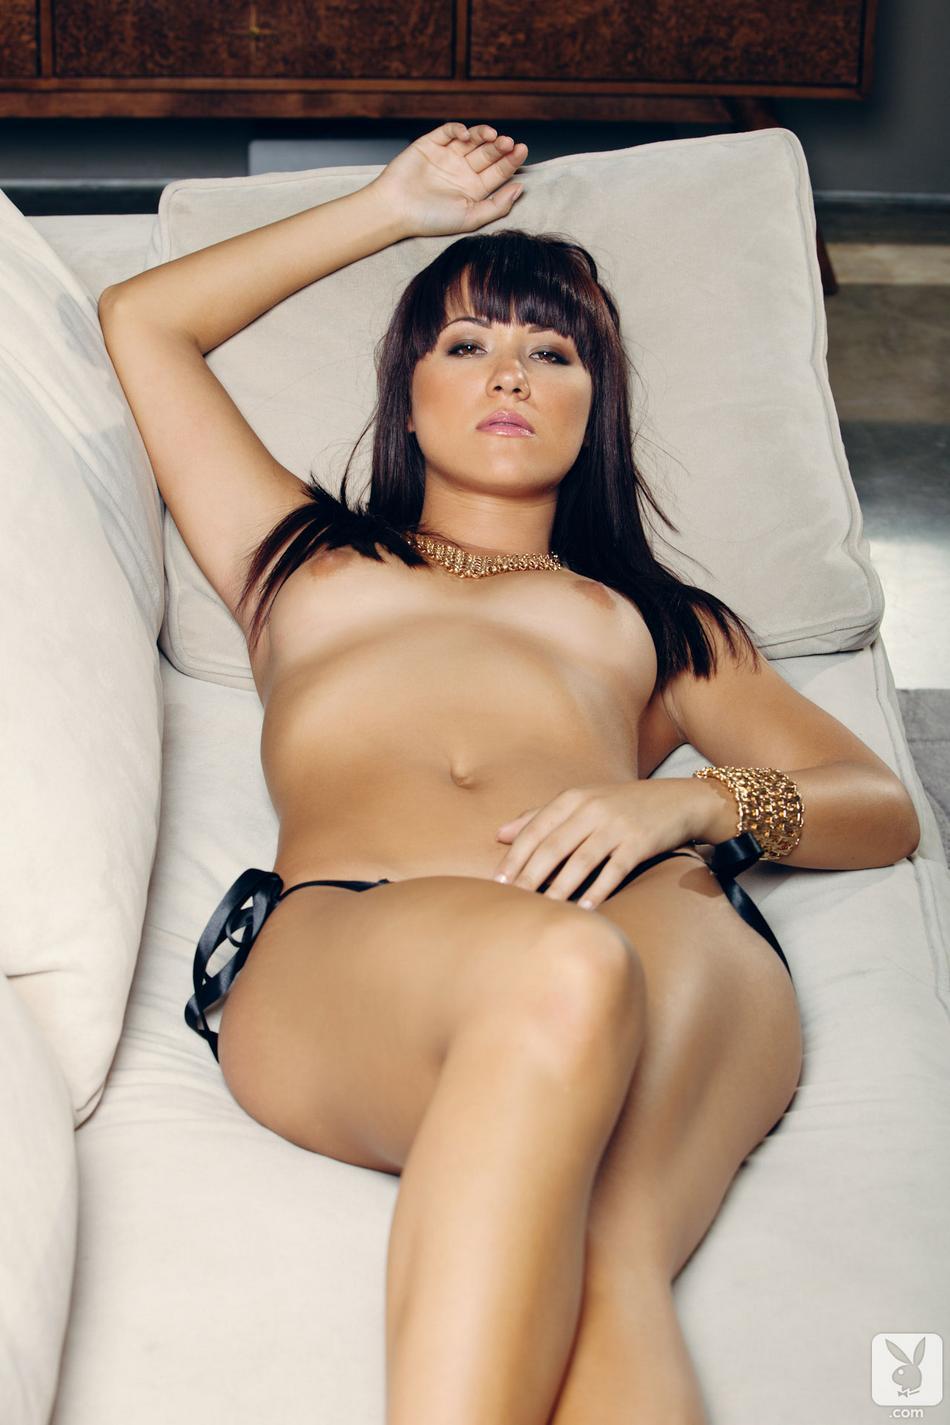 image Nude in public regina schulte aus halver